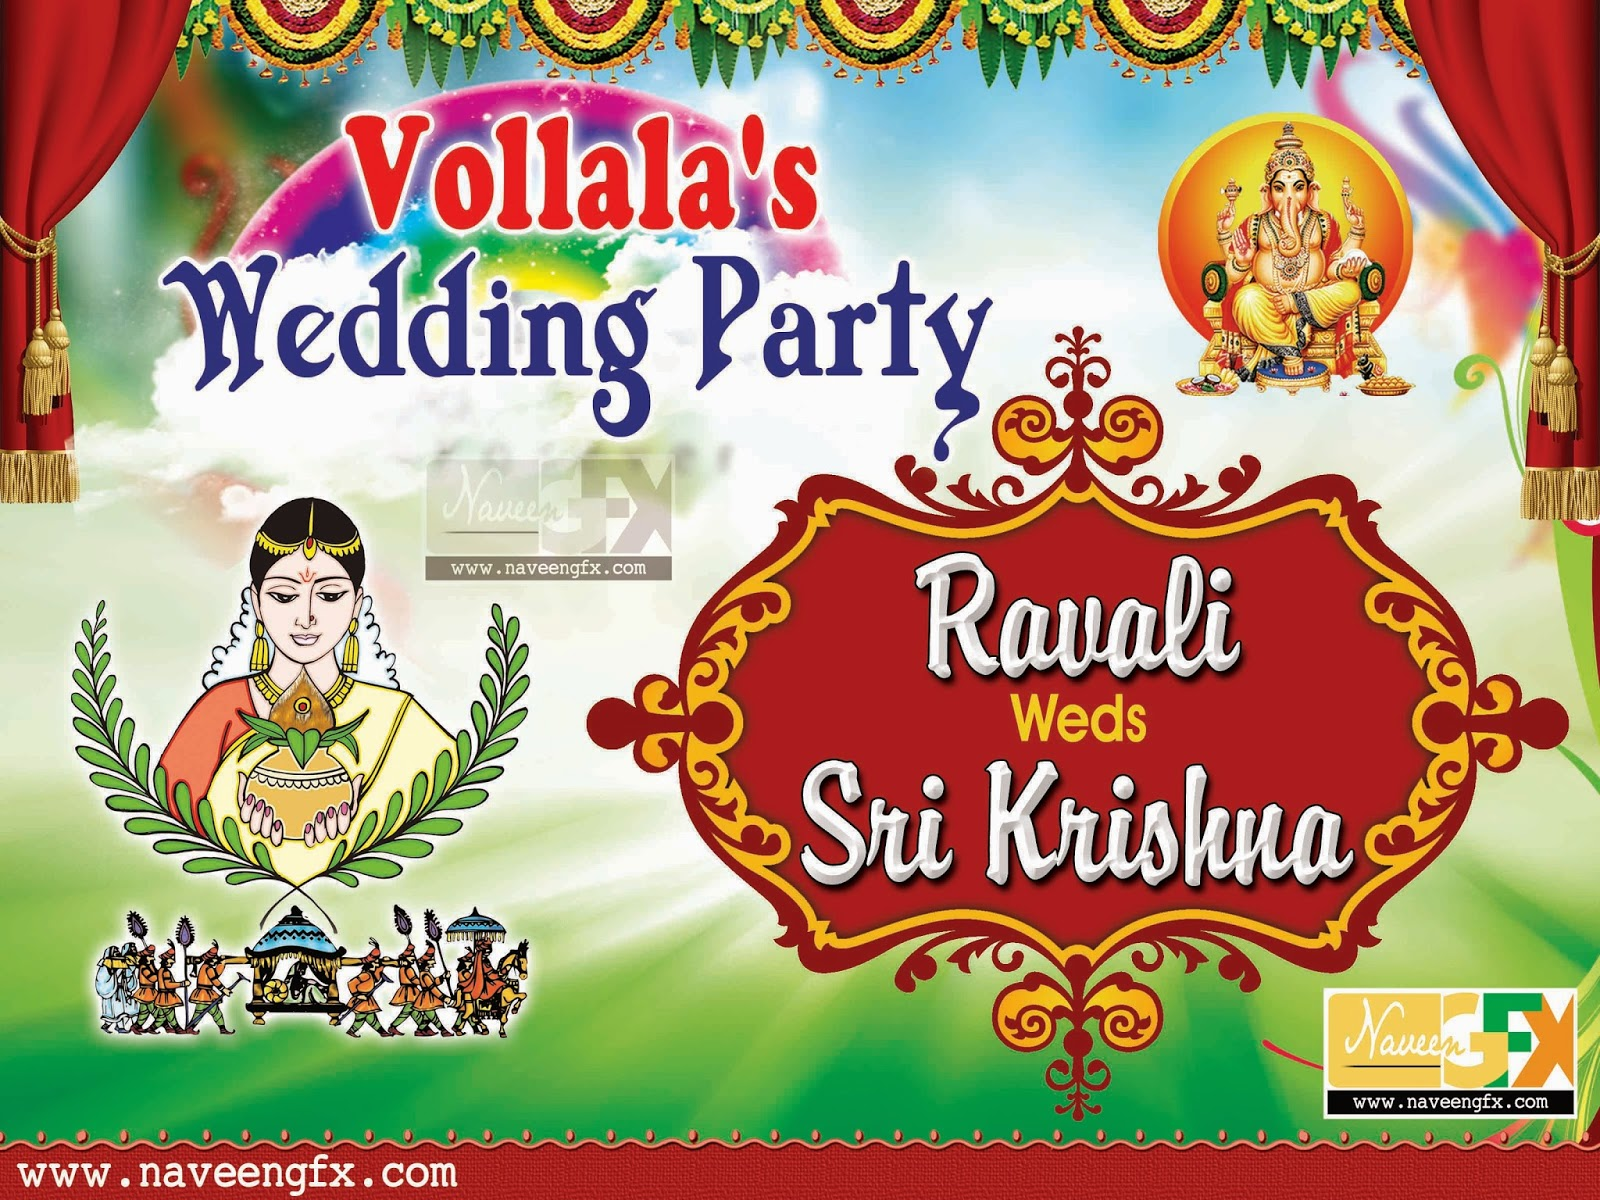 Wedding banner | naveengfx